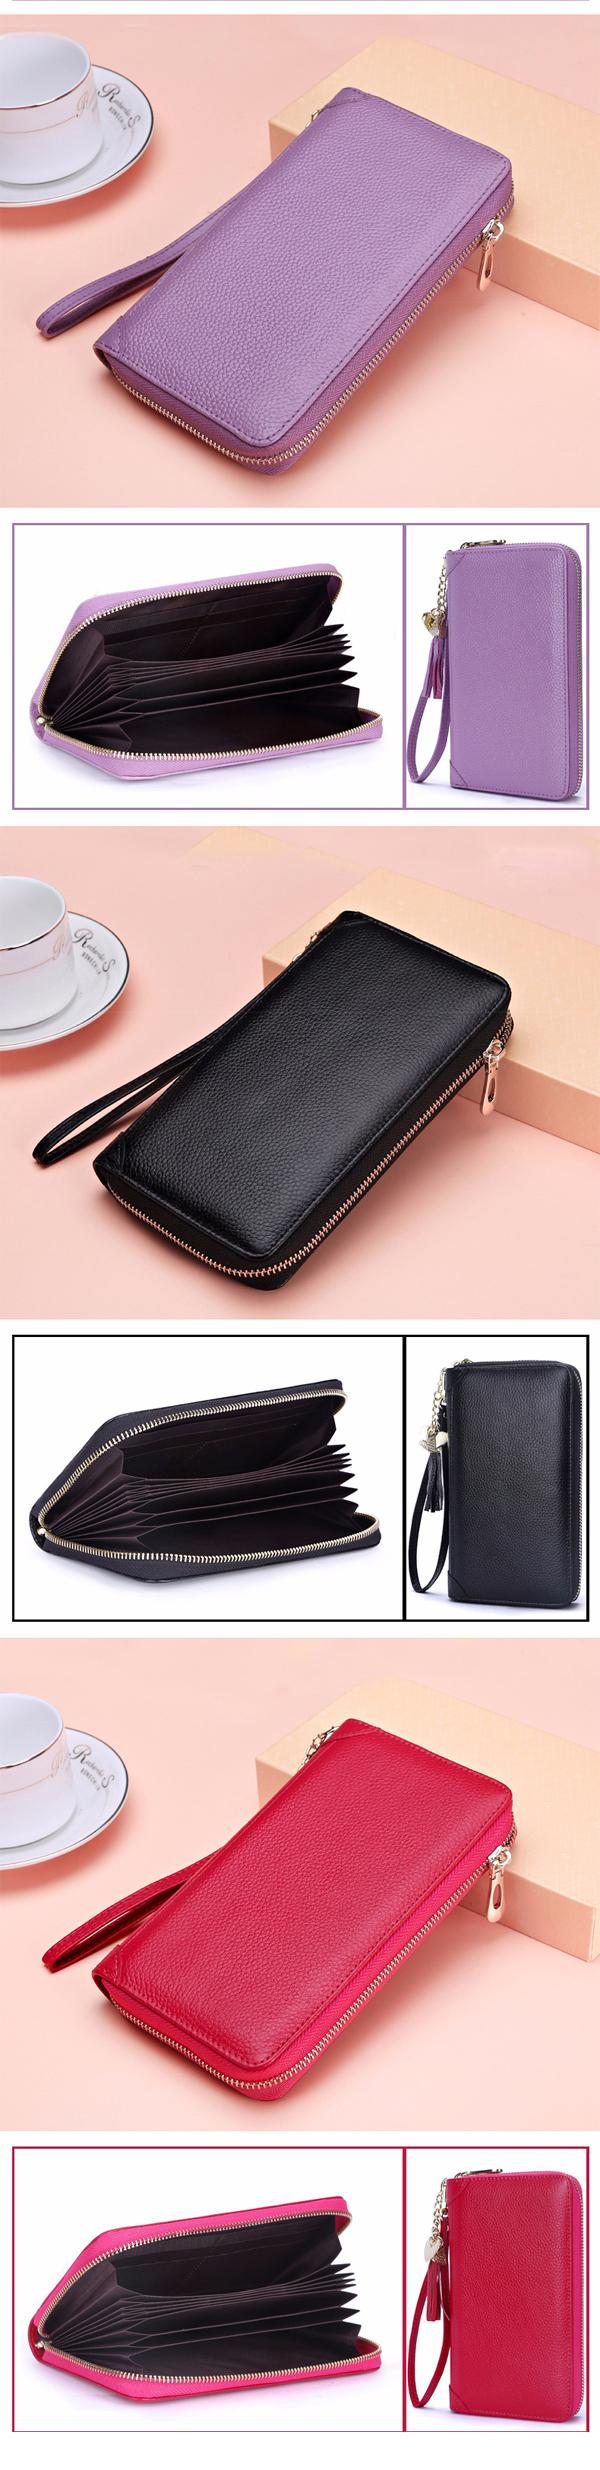 Genuine Leather Korean Tassel Women's Purse